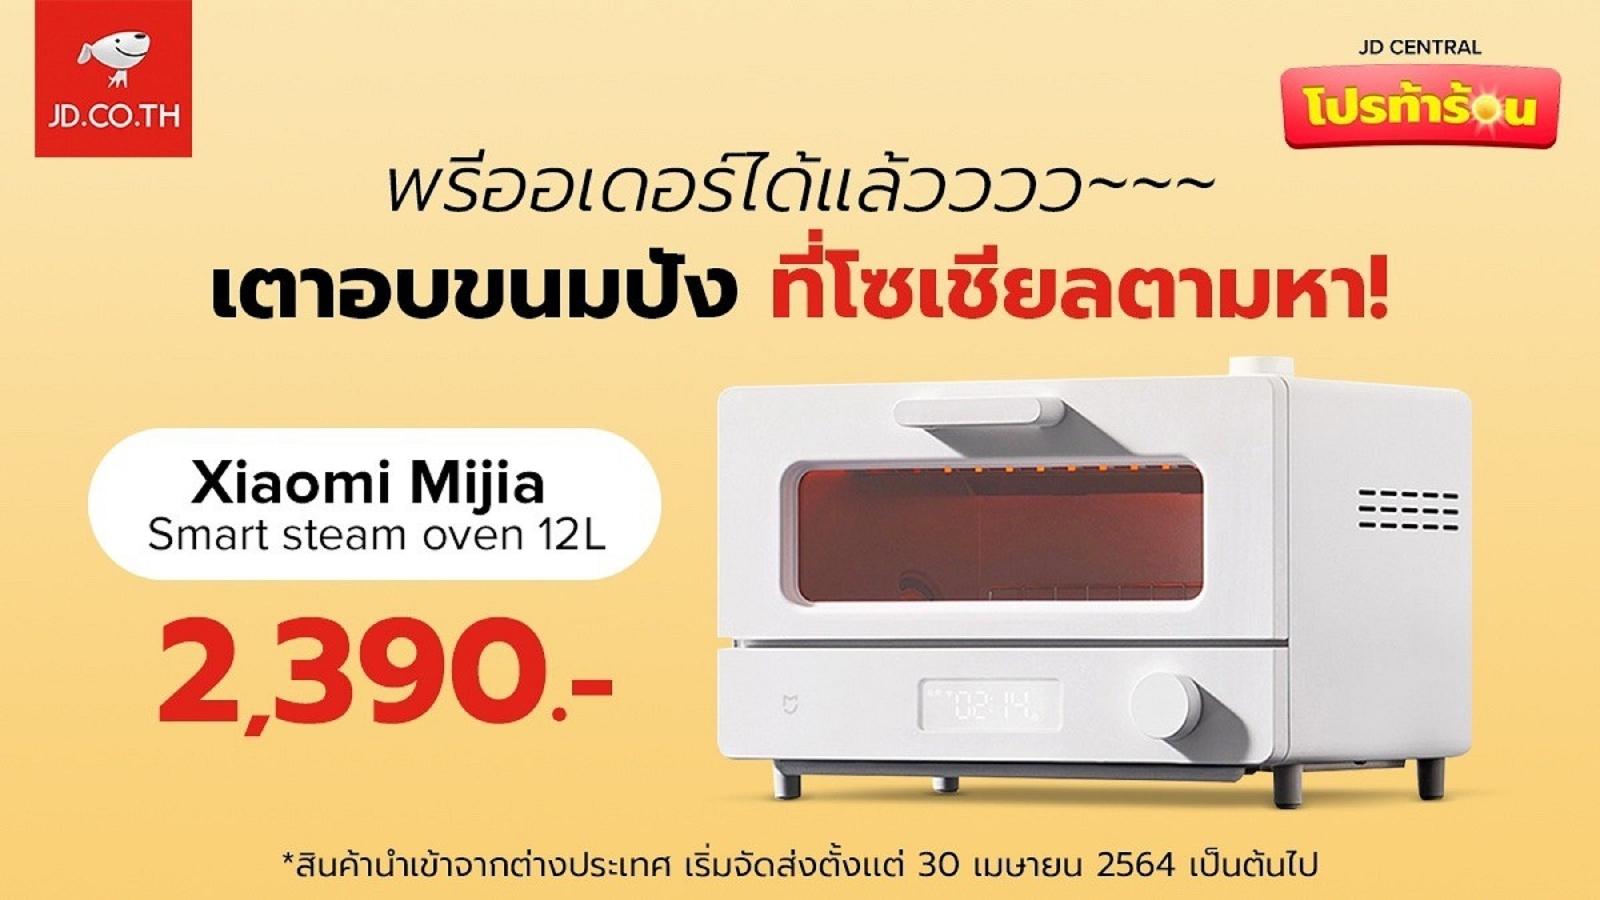 JD Central จับกระแสโซเชียลวางจำหน่าย เตาอบ XIAOMI MIJIA Smart Steam Oven ให้คุณช้อป !